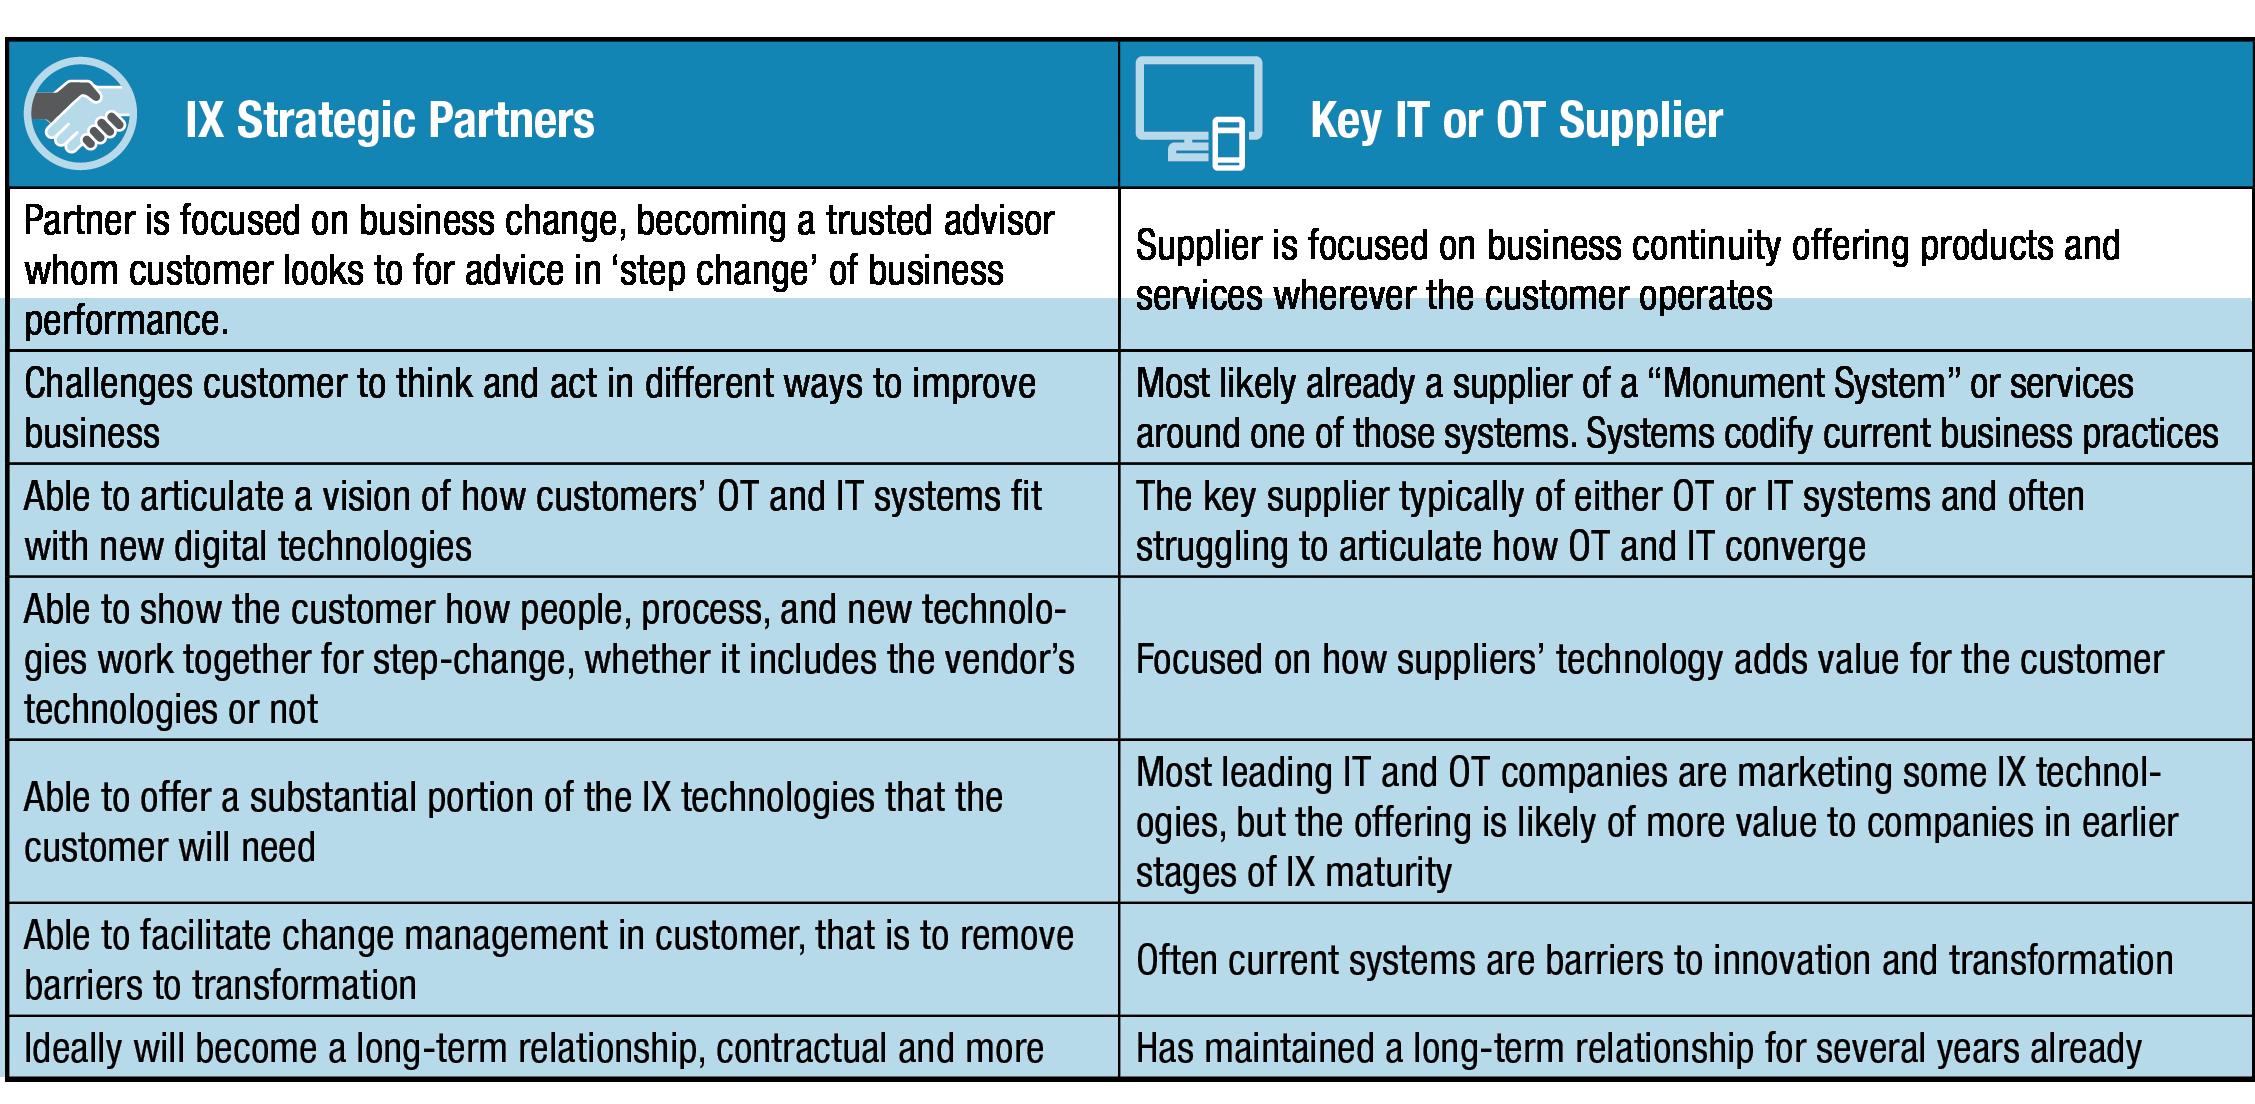 IX Strategic Partners and Key IT or OT Suppliers